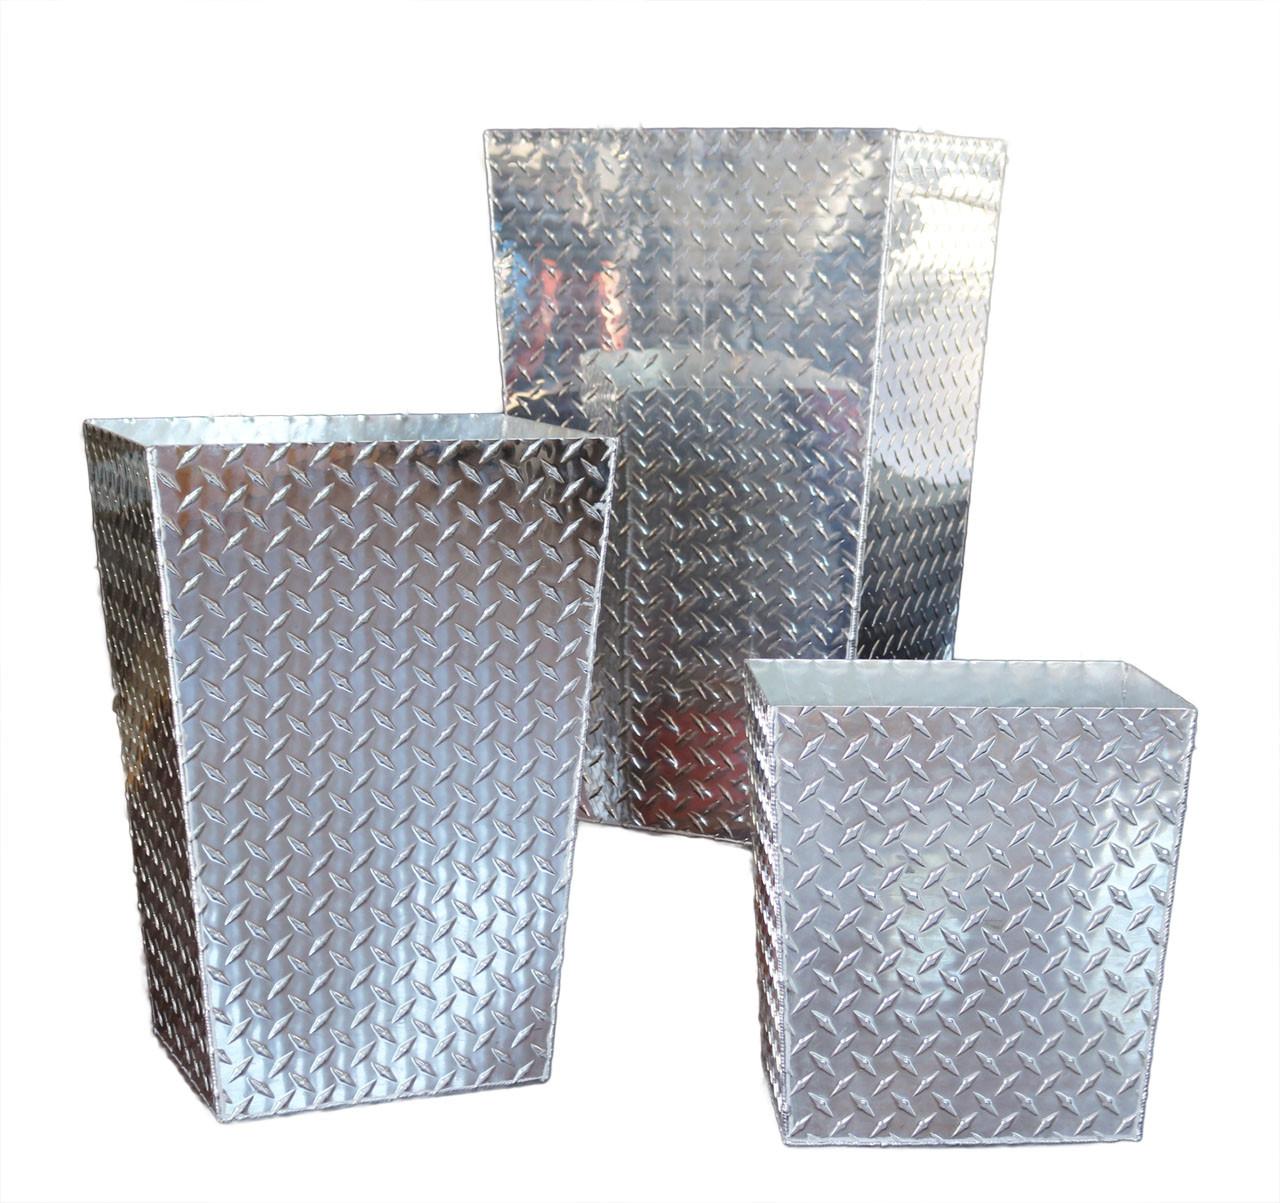 Diamond Plate Trash Cans, Three Sizes Shown